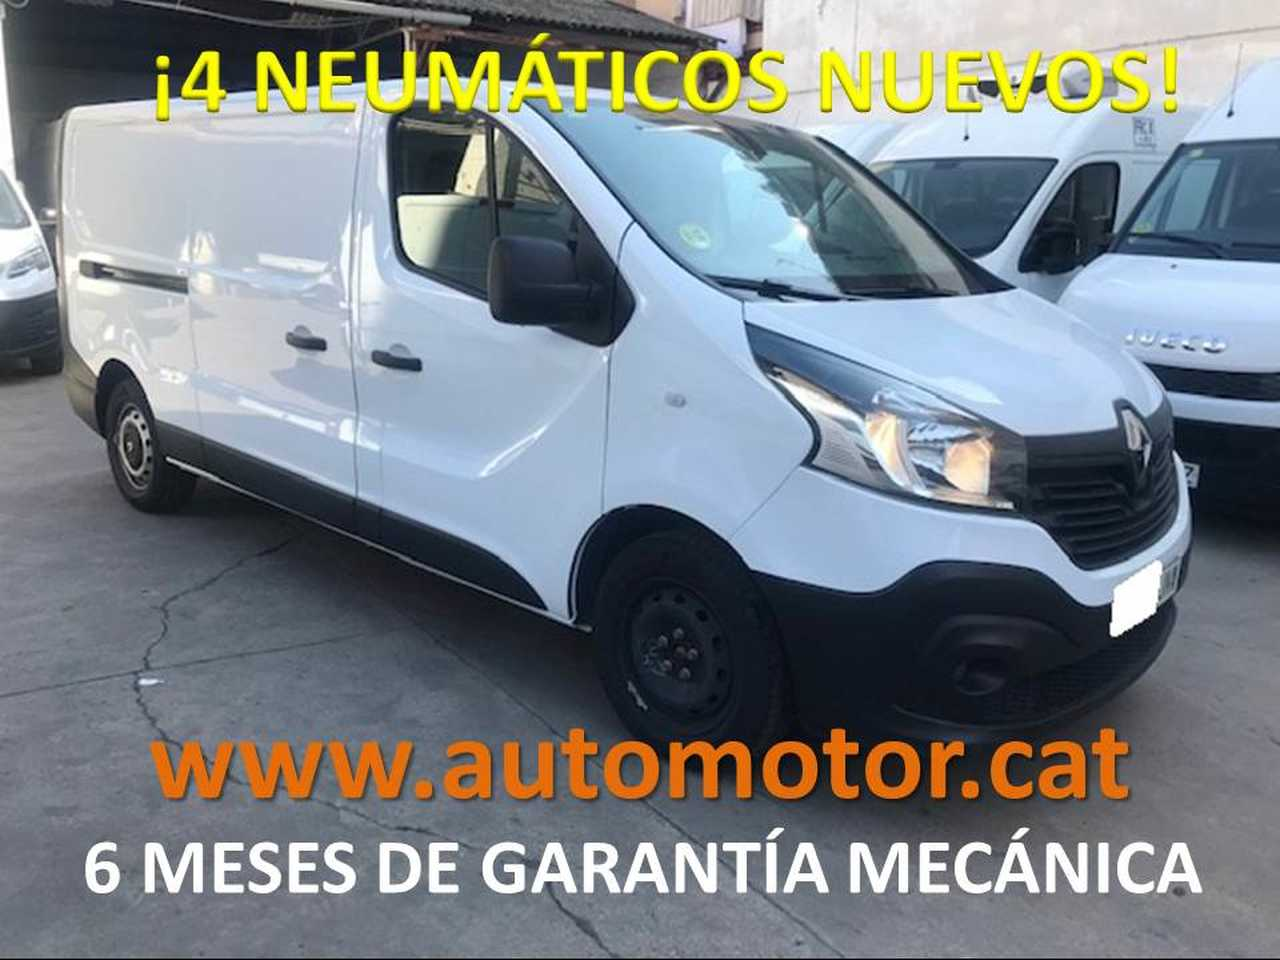 Renault Trafic Furgón 29 L2H1 dCi - GARANTIA MECANICA  - Foto 1